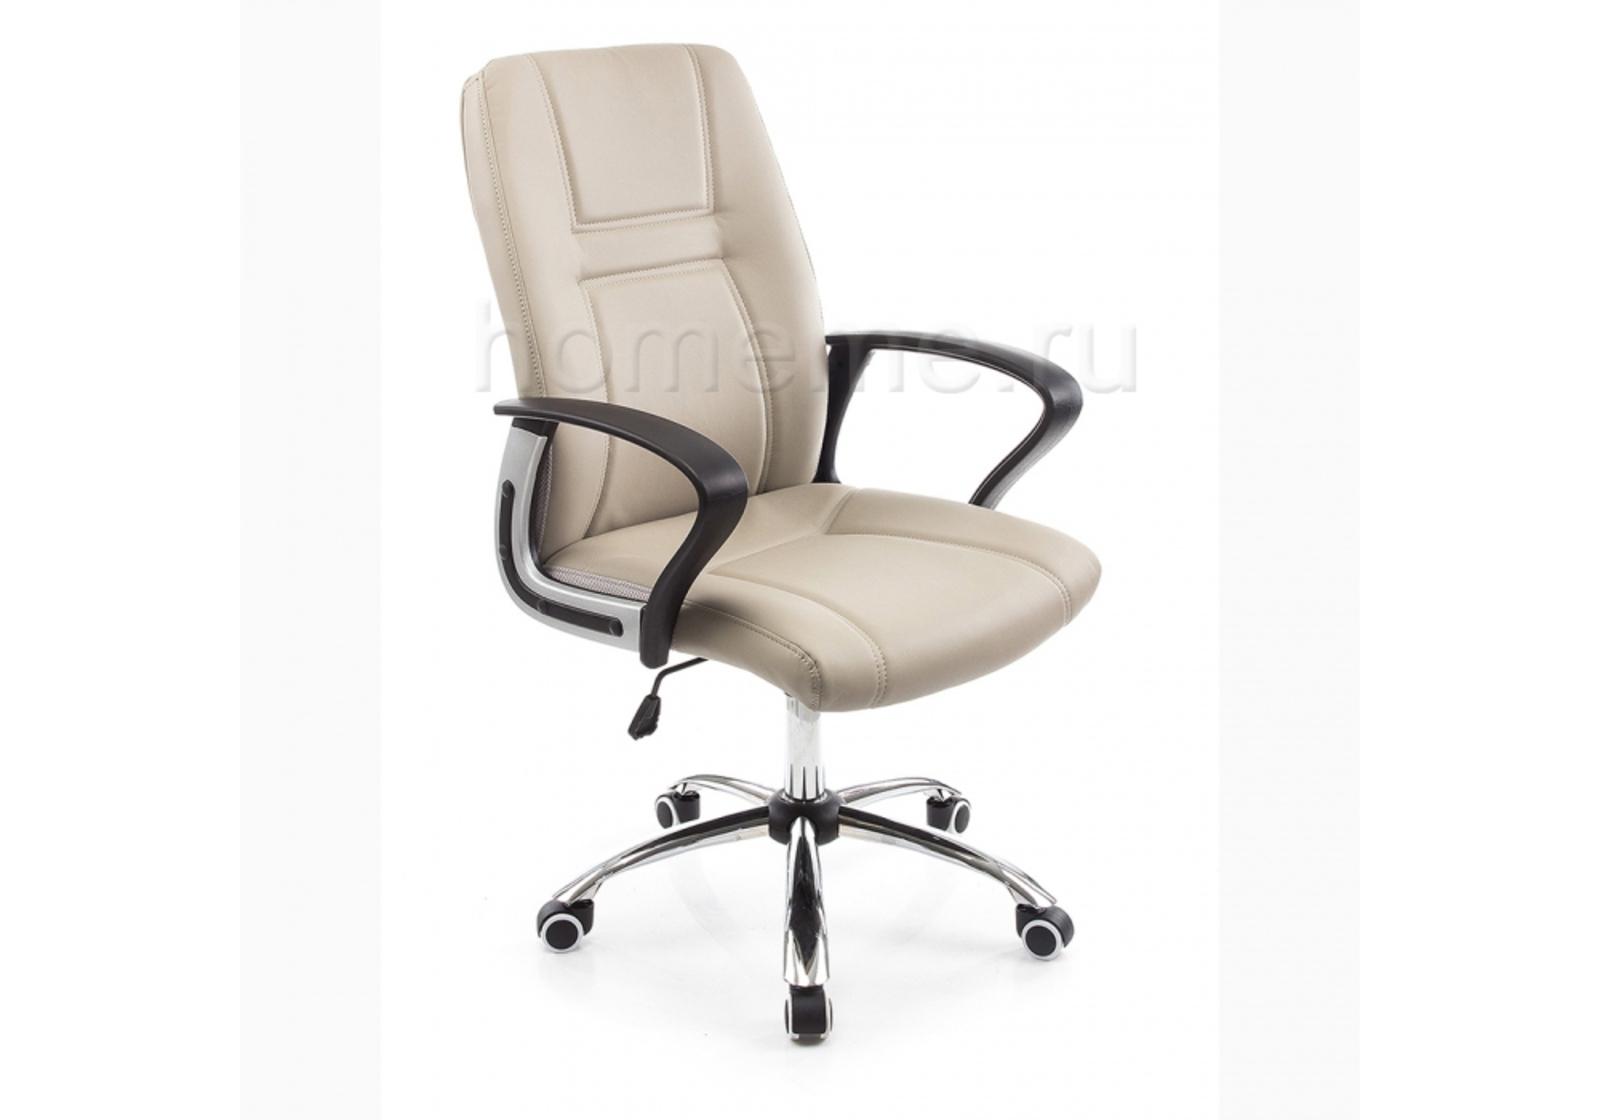 Кресло для офиса HomeMe Blanes серое 1735 от Homeme.ru